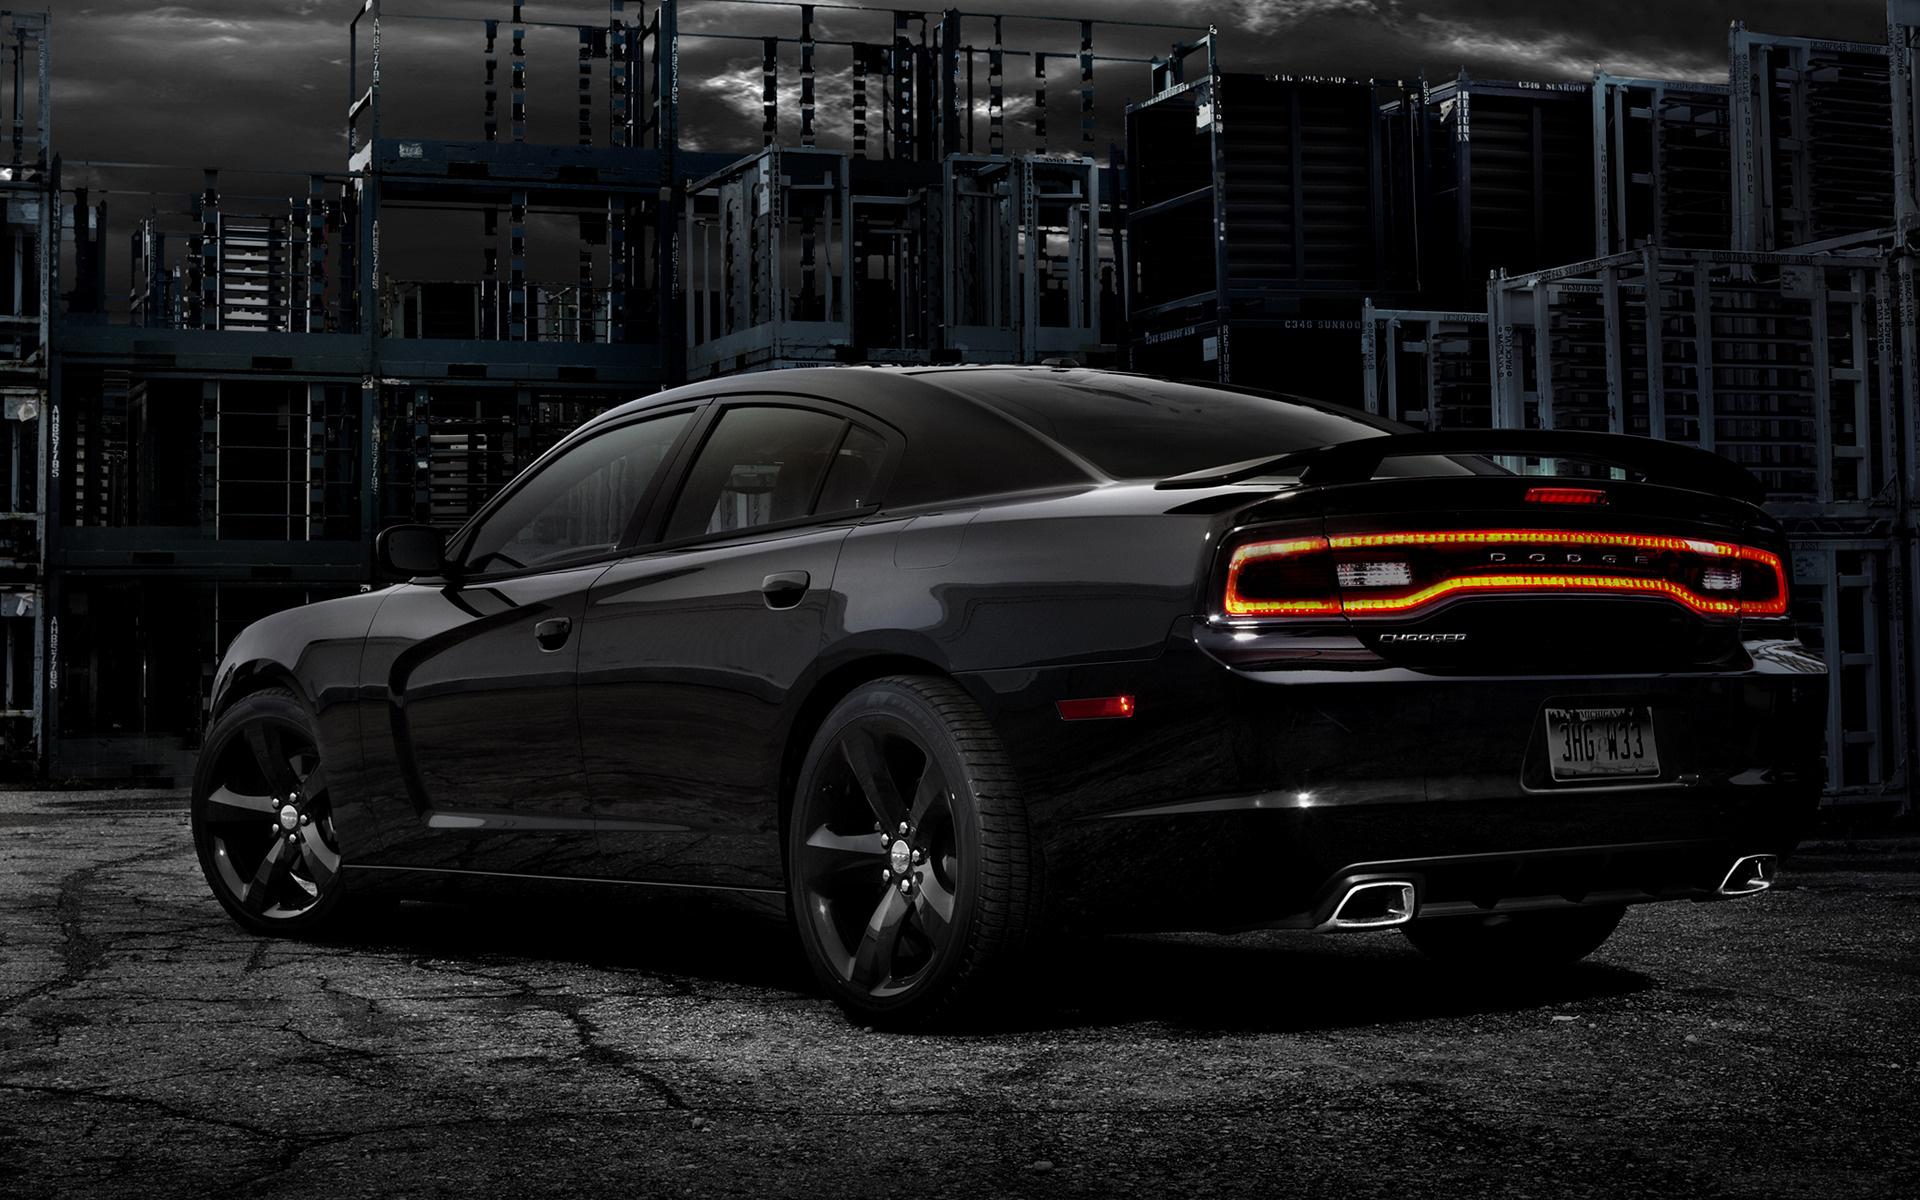 2012 Dodge Charger Blacktop